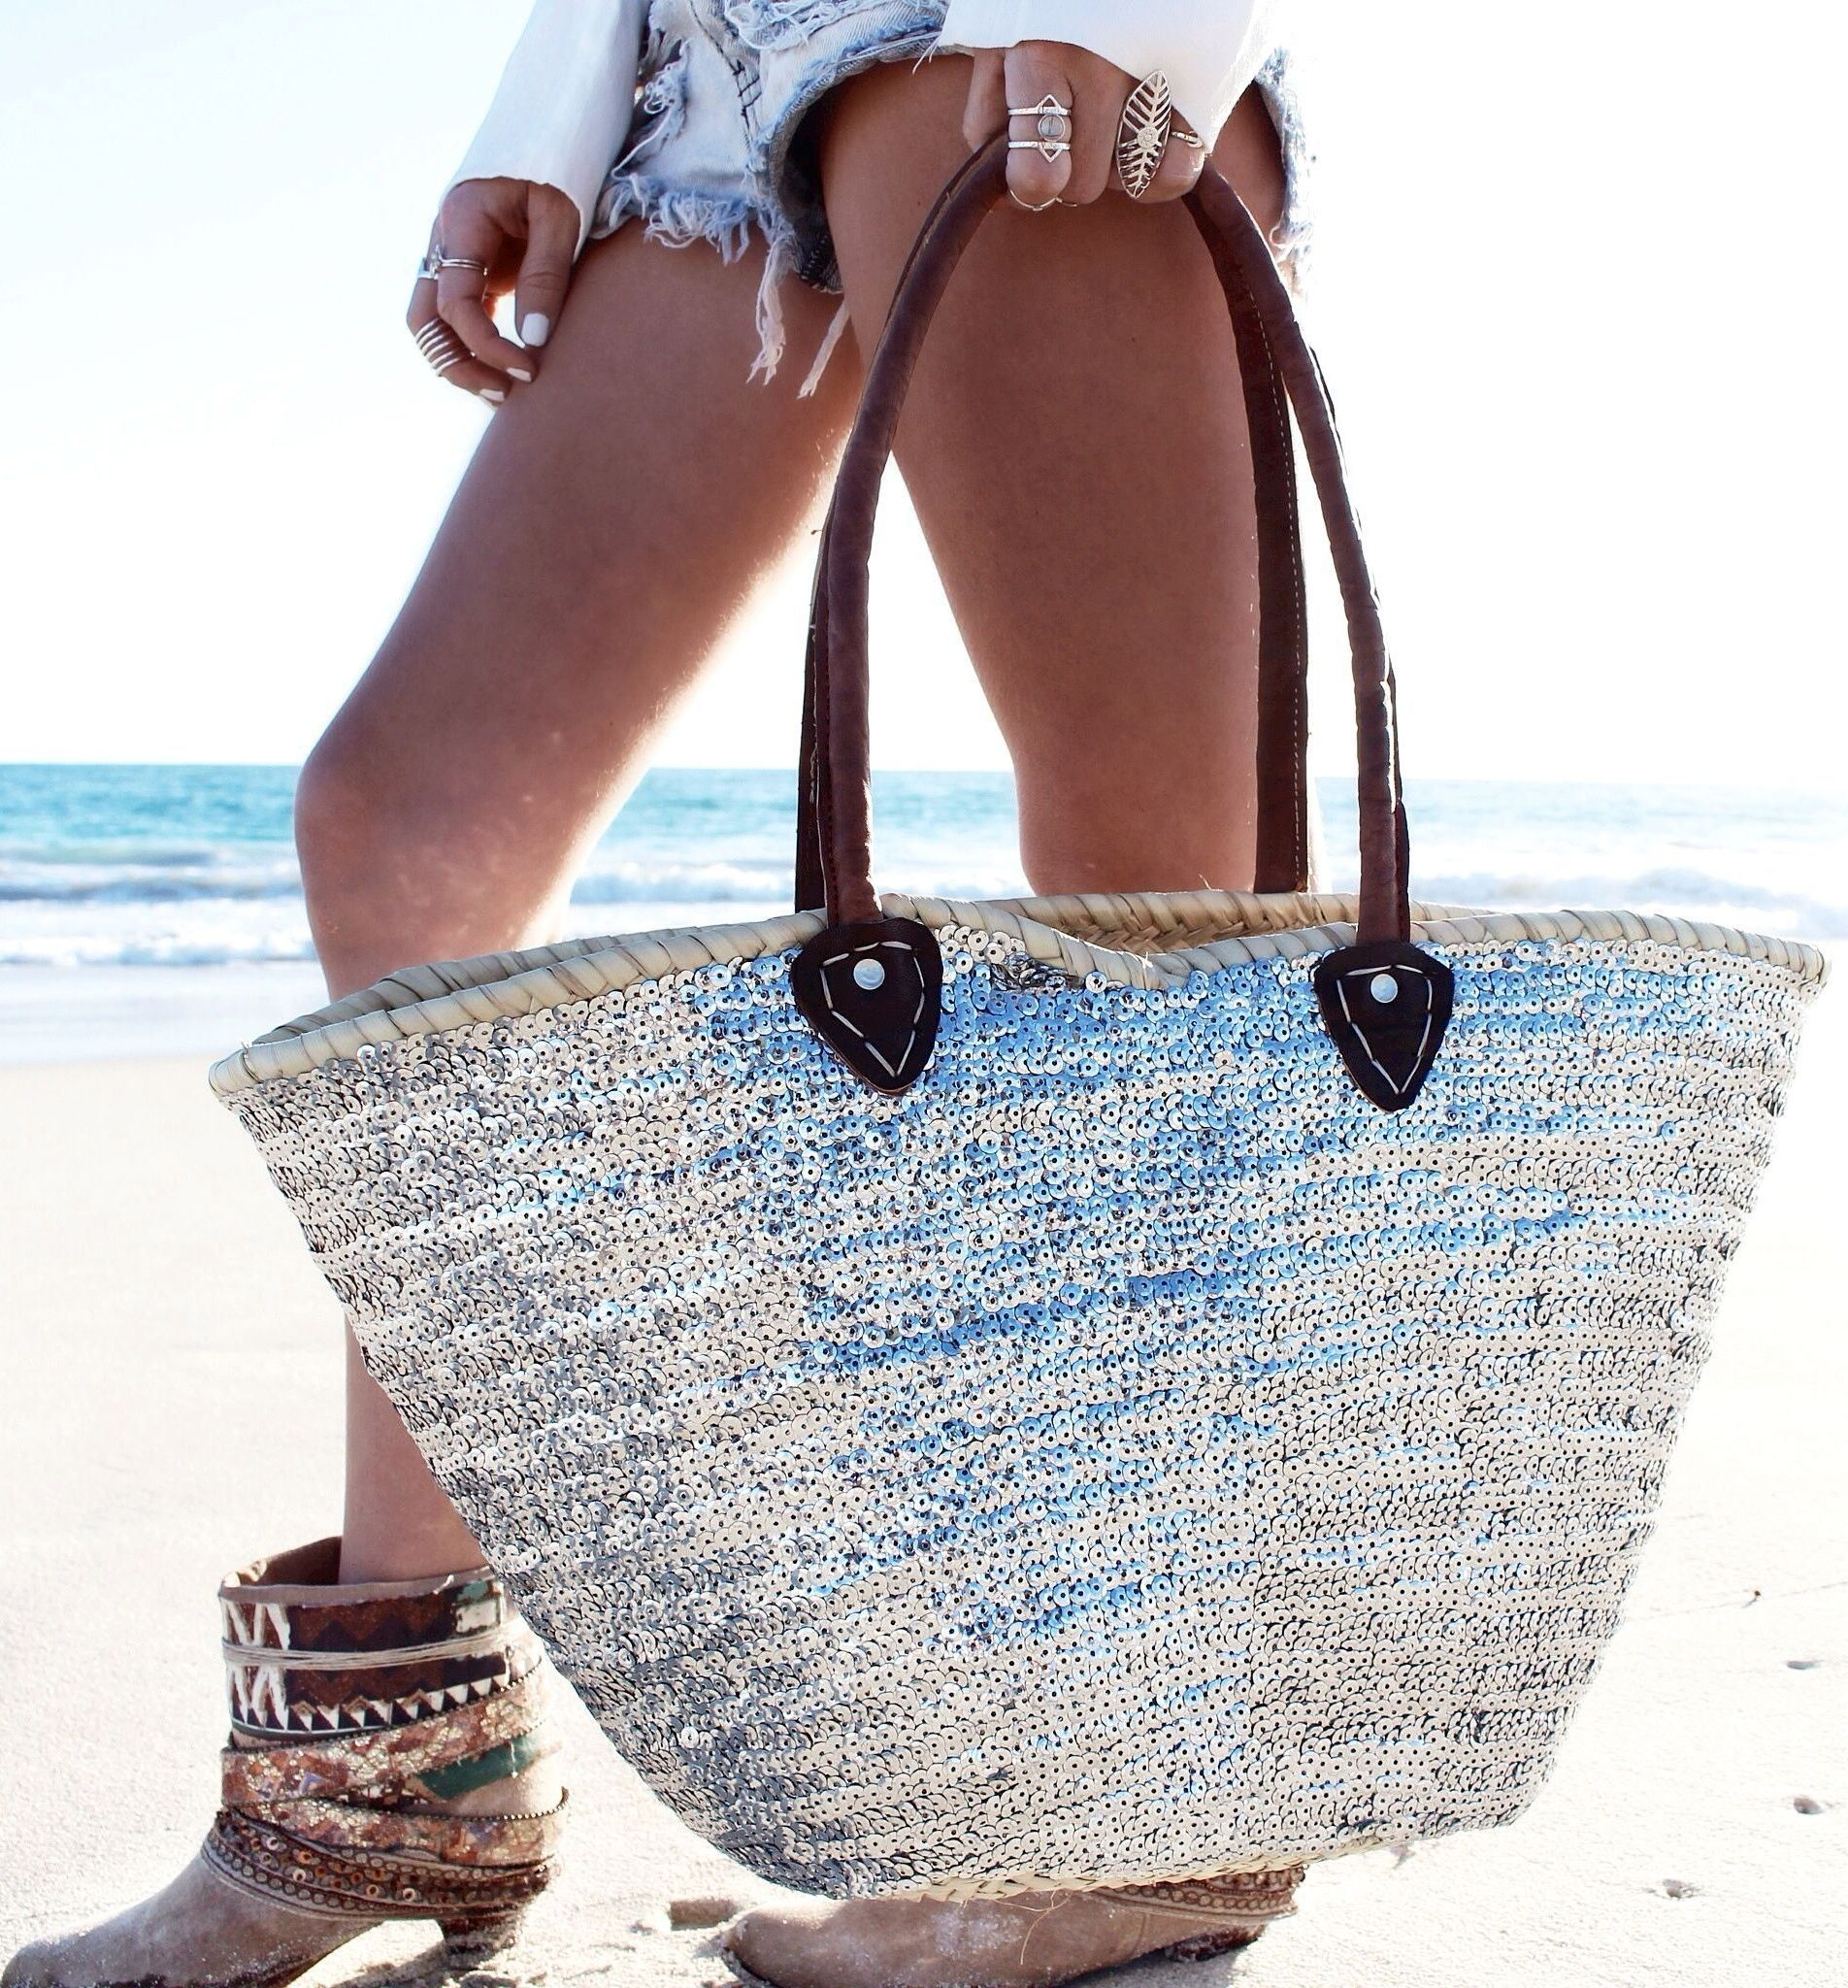 Metallic Silver Sequin Beach Tote by Gypsy Lovin Summer | Handbags ...